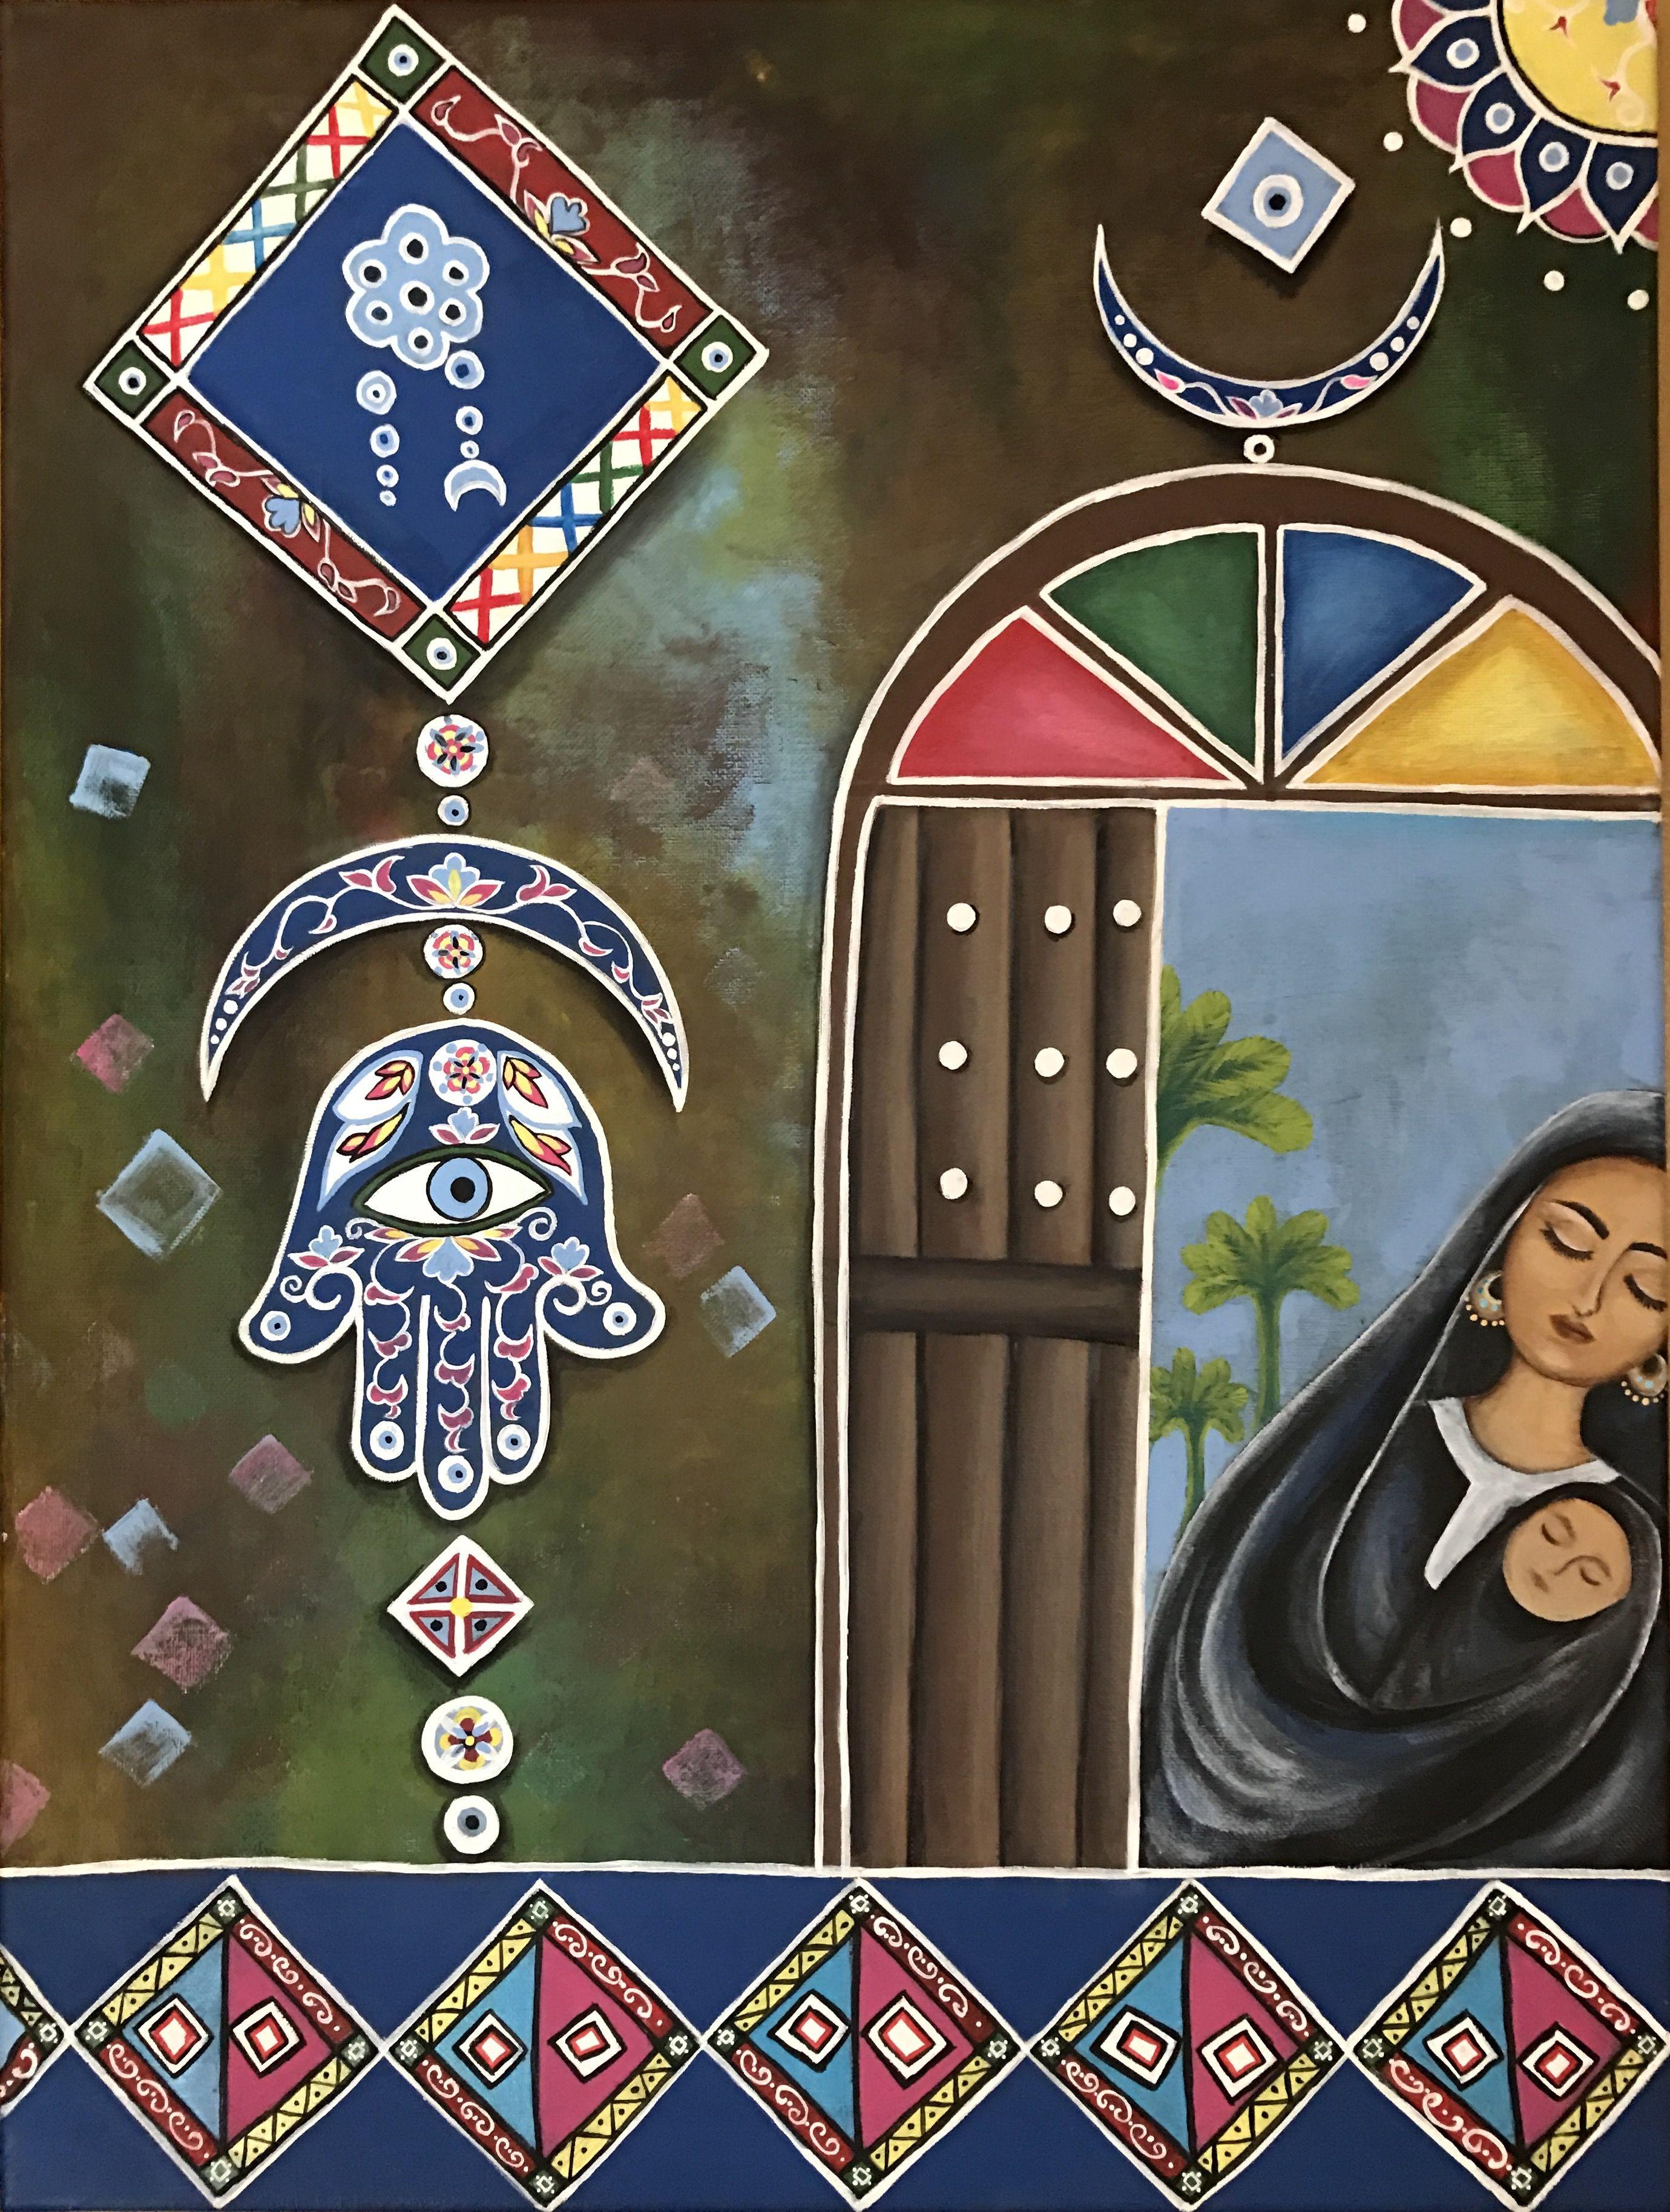 رسومات عراقية فن تشكيلي Hamsa Hand If Fatimaعراقي عن الأم African Art Paintings Egyptian Painting Canvas Art Painting